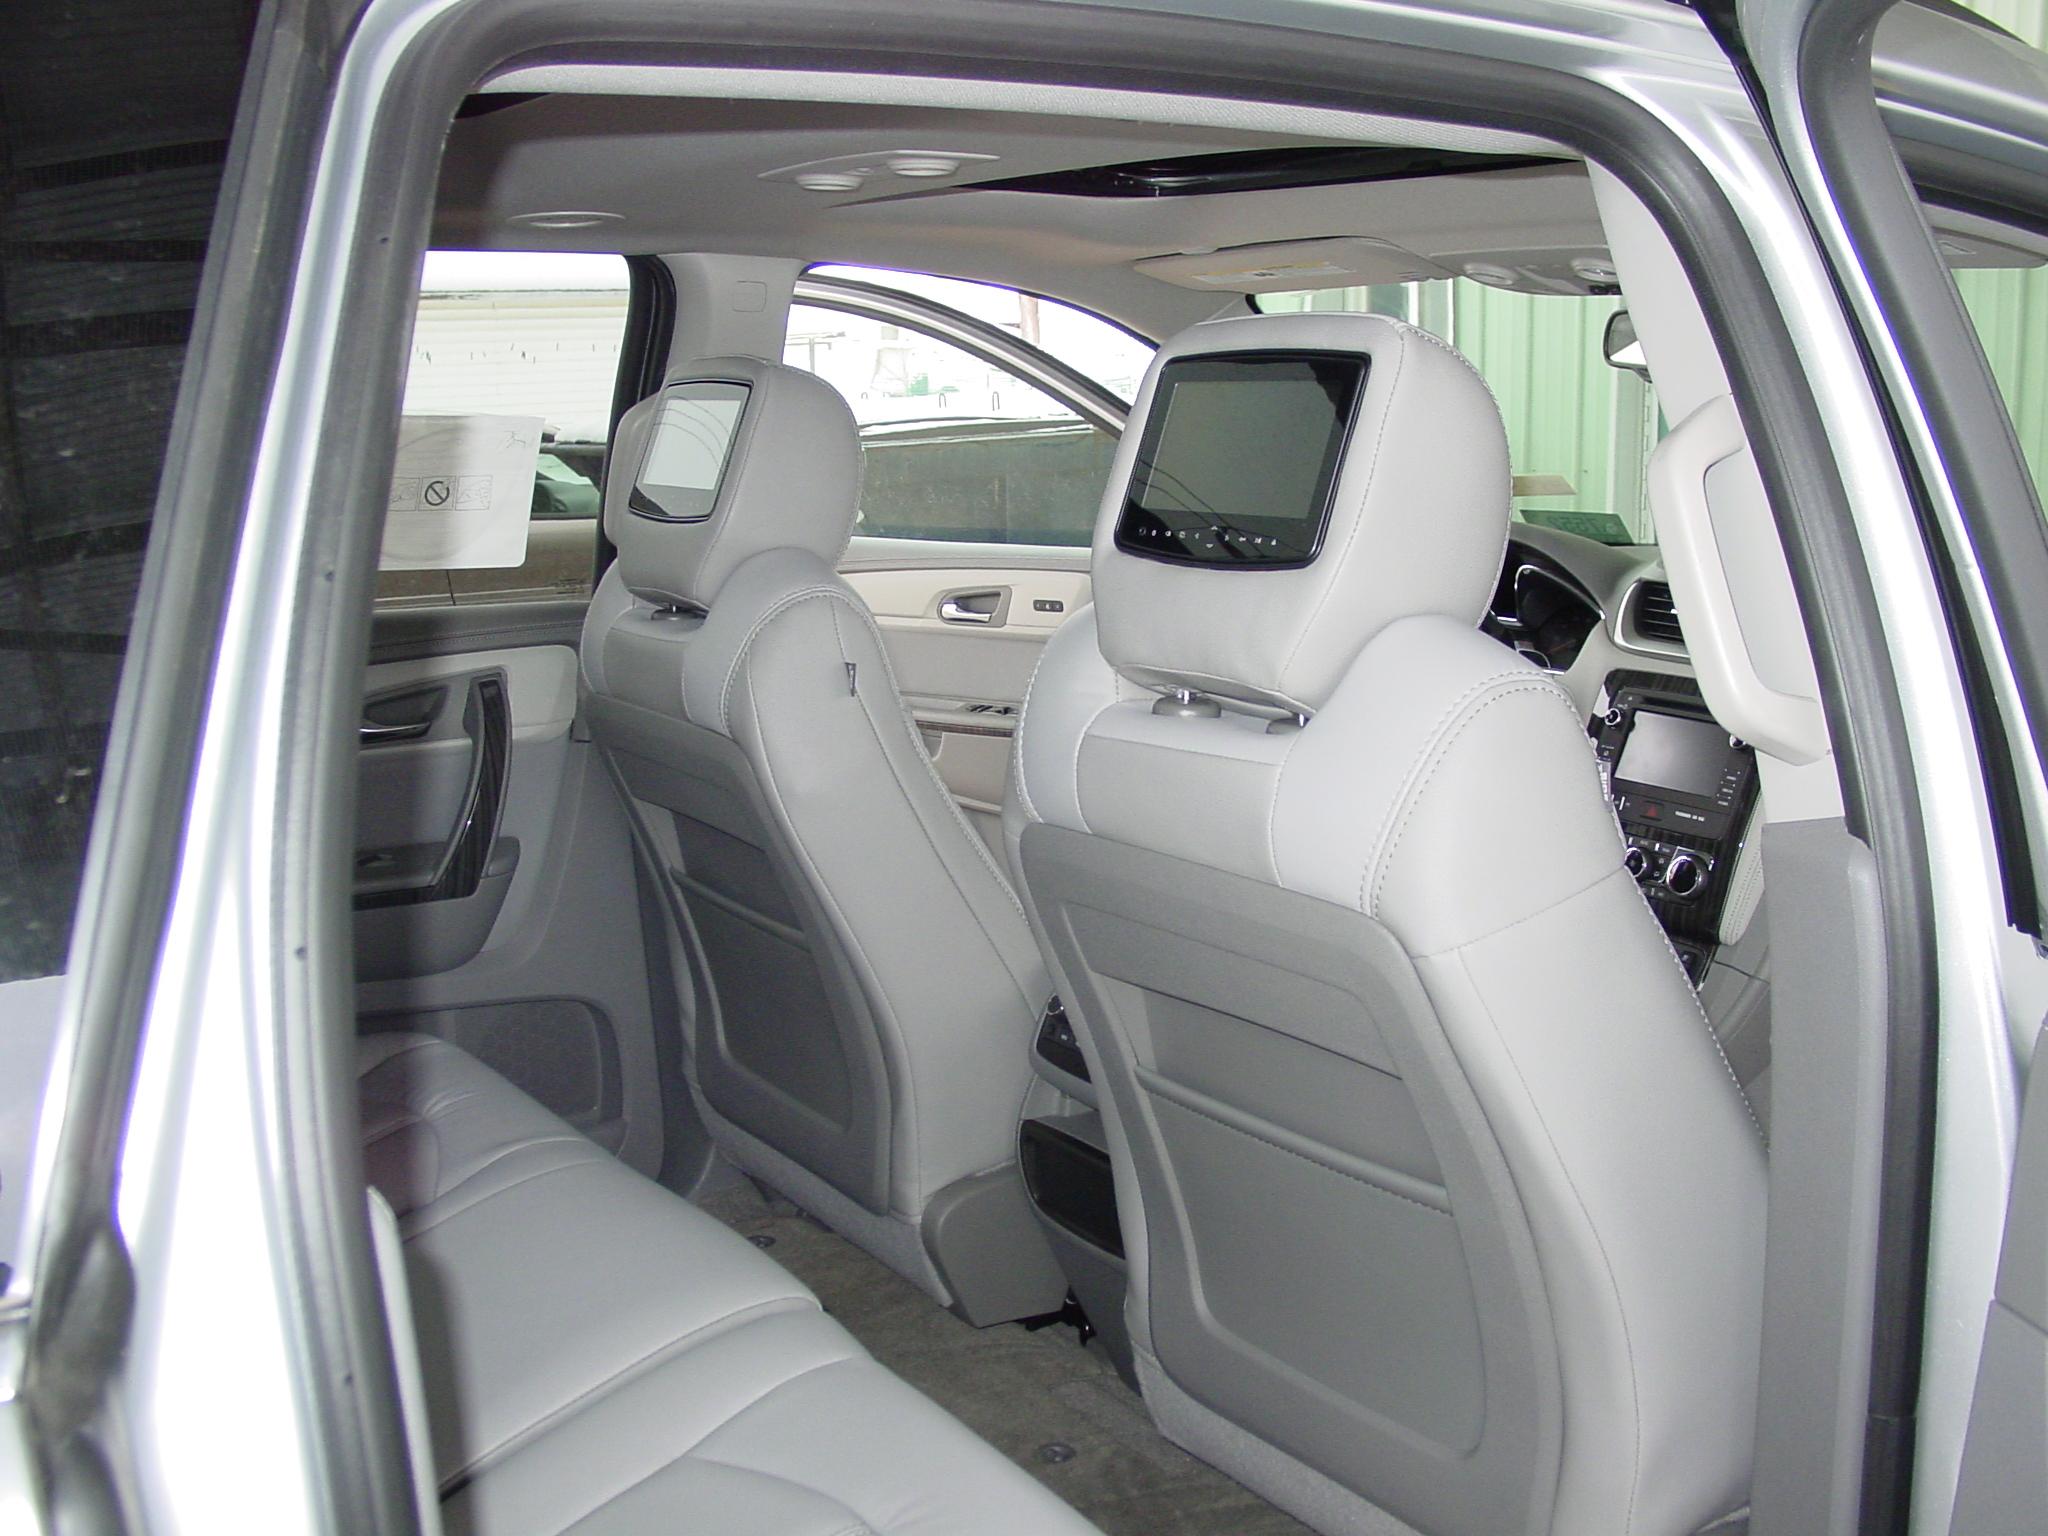 2013 Chevy Traverse